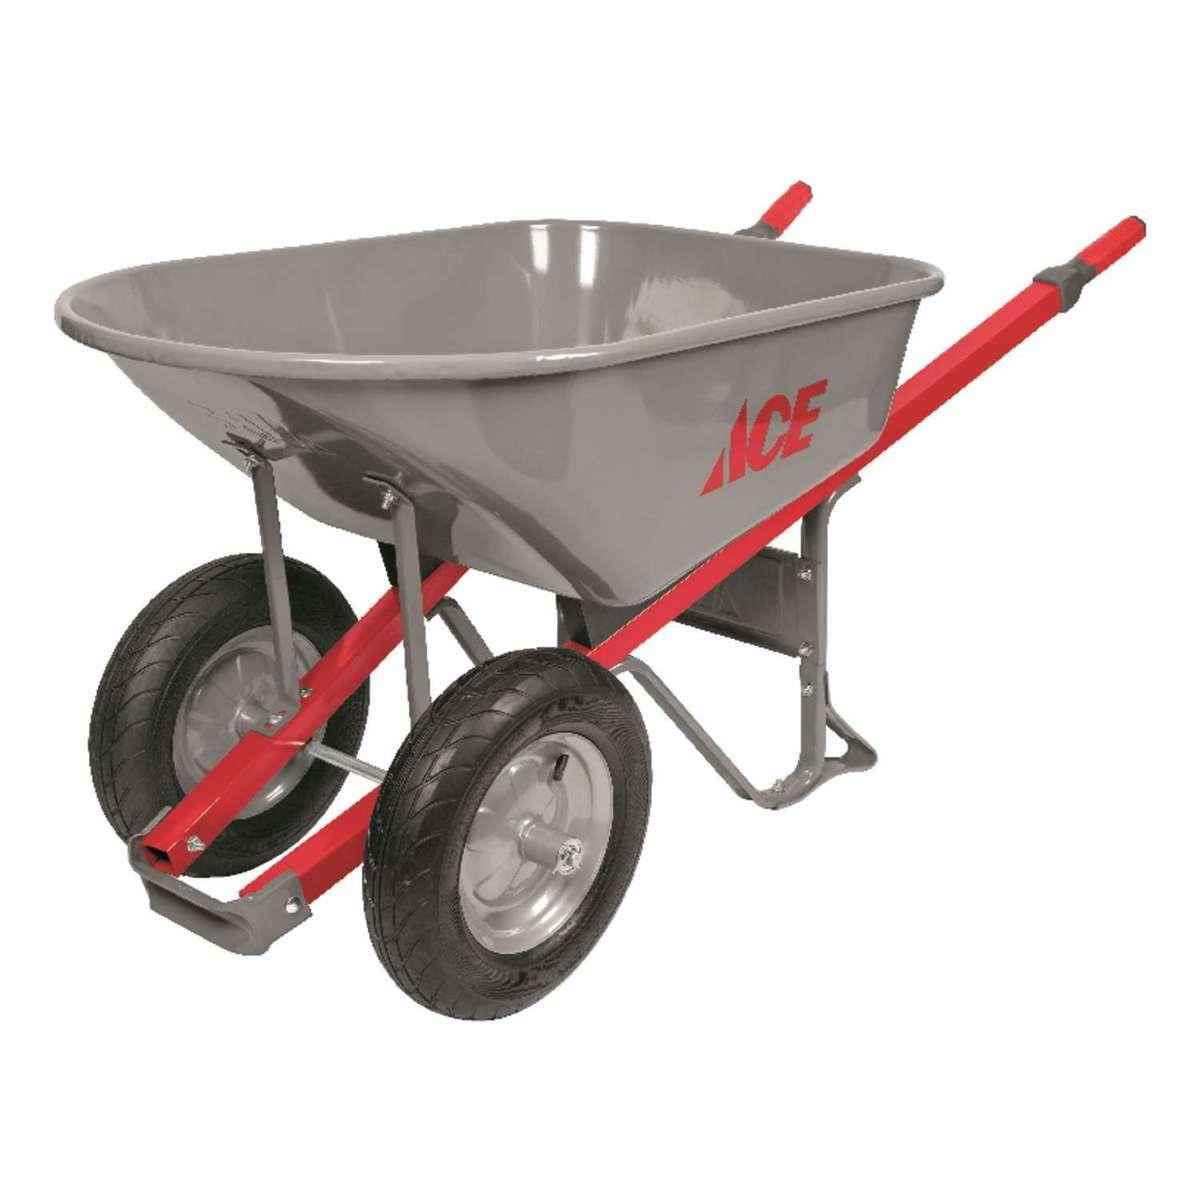 Ace 6 Cu. Ft. Steel Wheelbarrow thumbnail